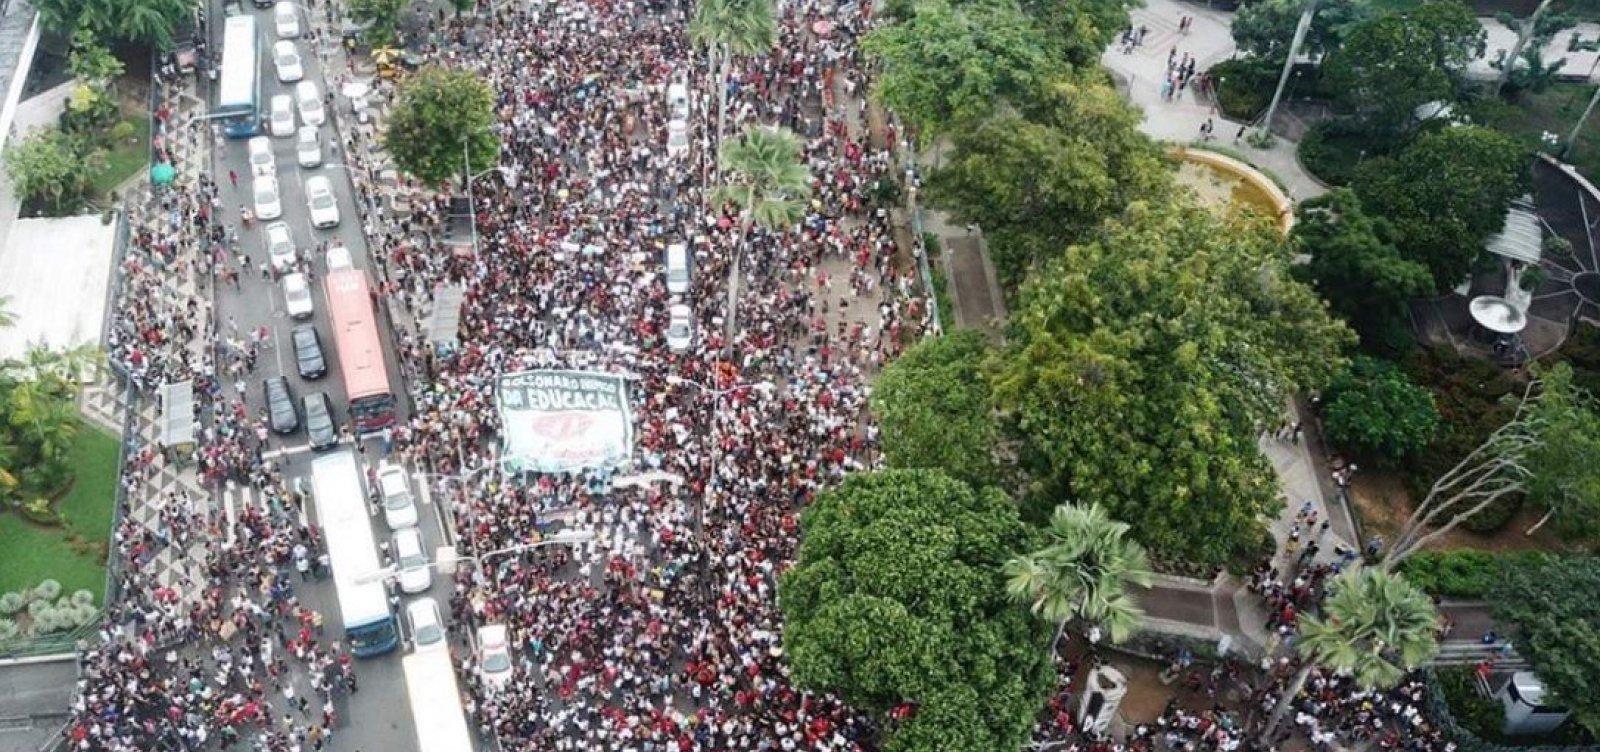 [UNE rebate Bolsonaro: 'Só lamento que nos ache idiotas, somos brasileiros responsáveis com o futuro']